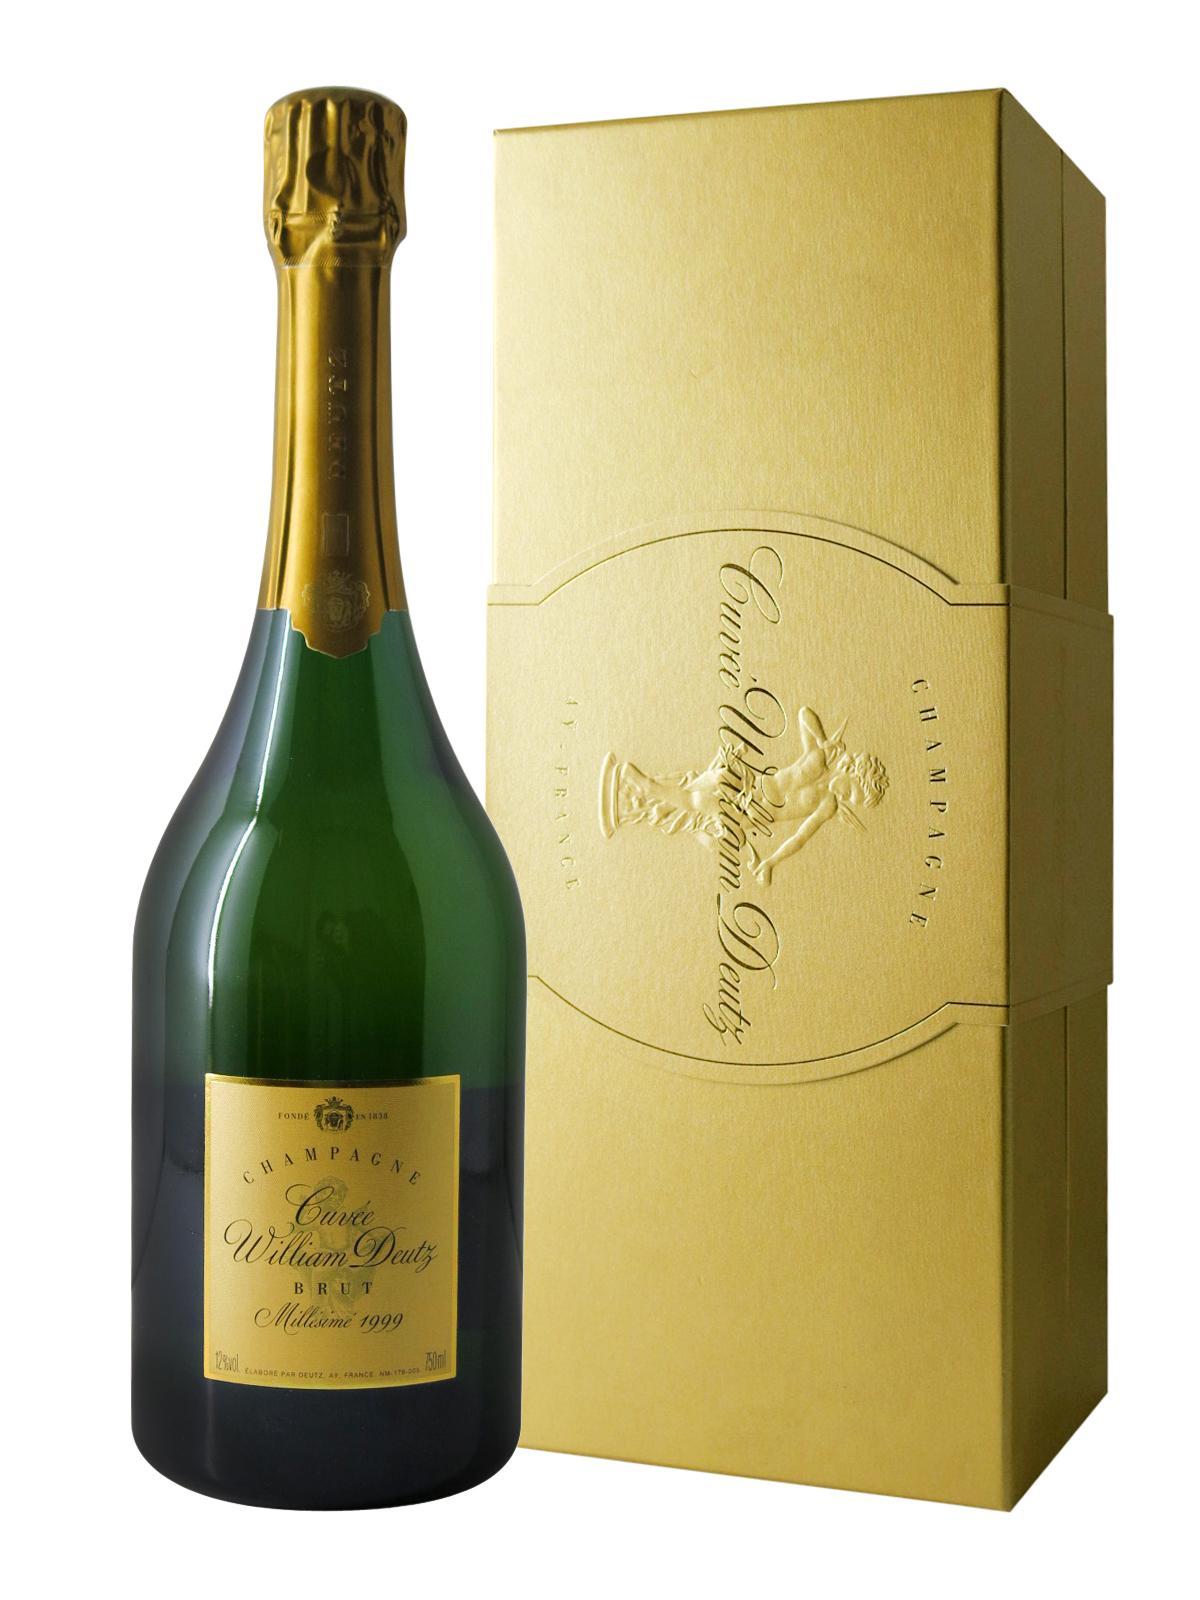 Champagne deutz millesime 1999